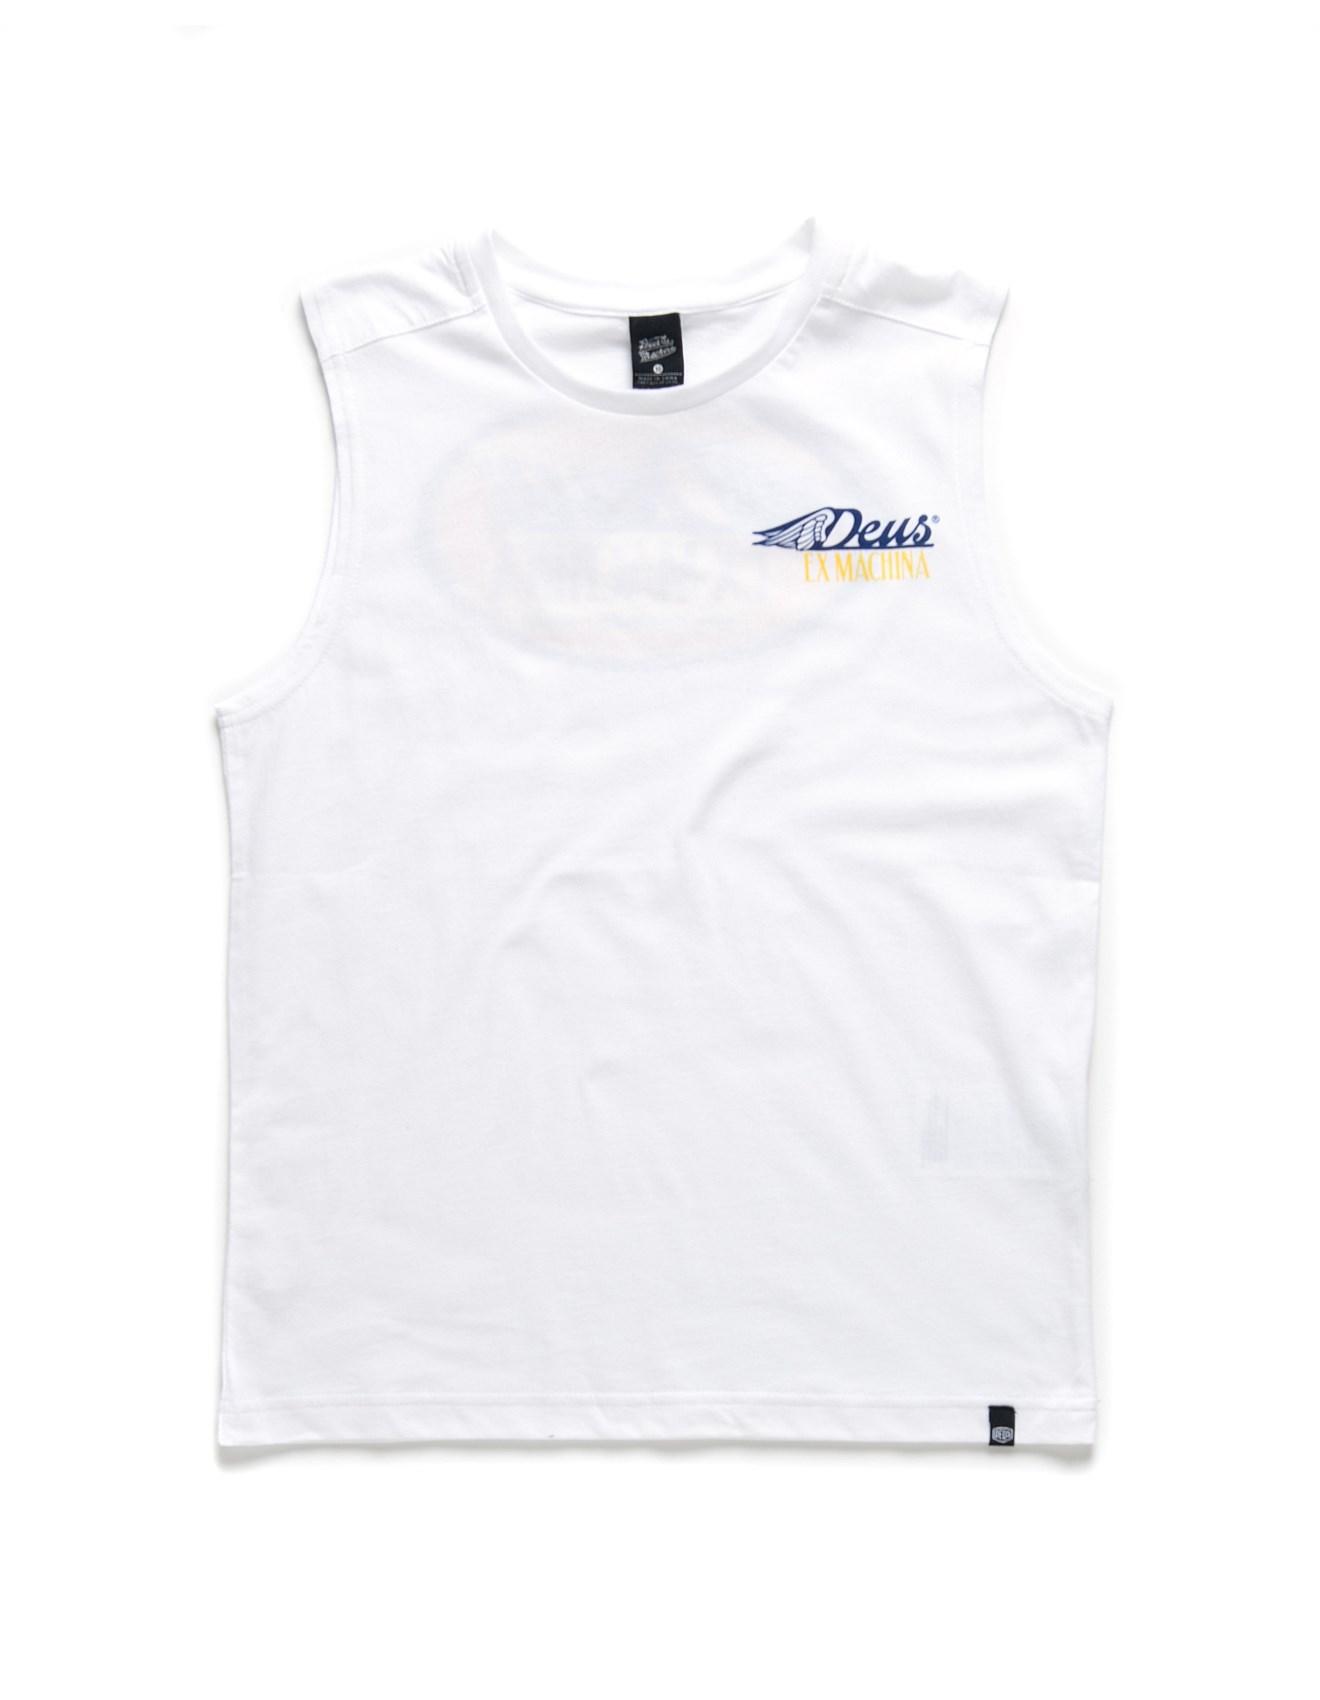 Boy's Sleeveless Shirts & Tops + FREE SHIPPING | Clothing